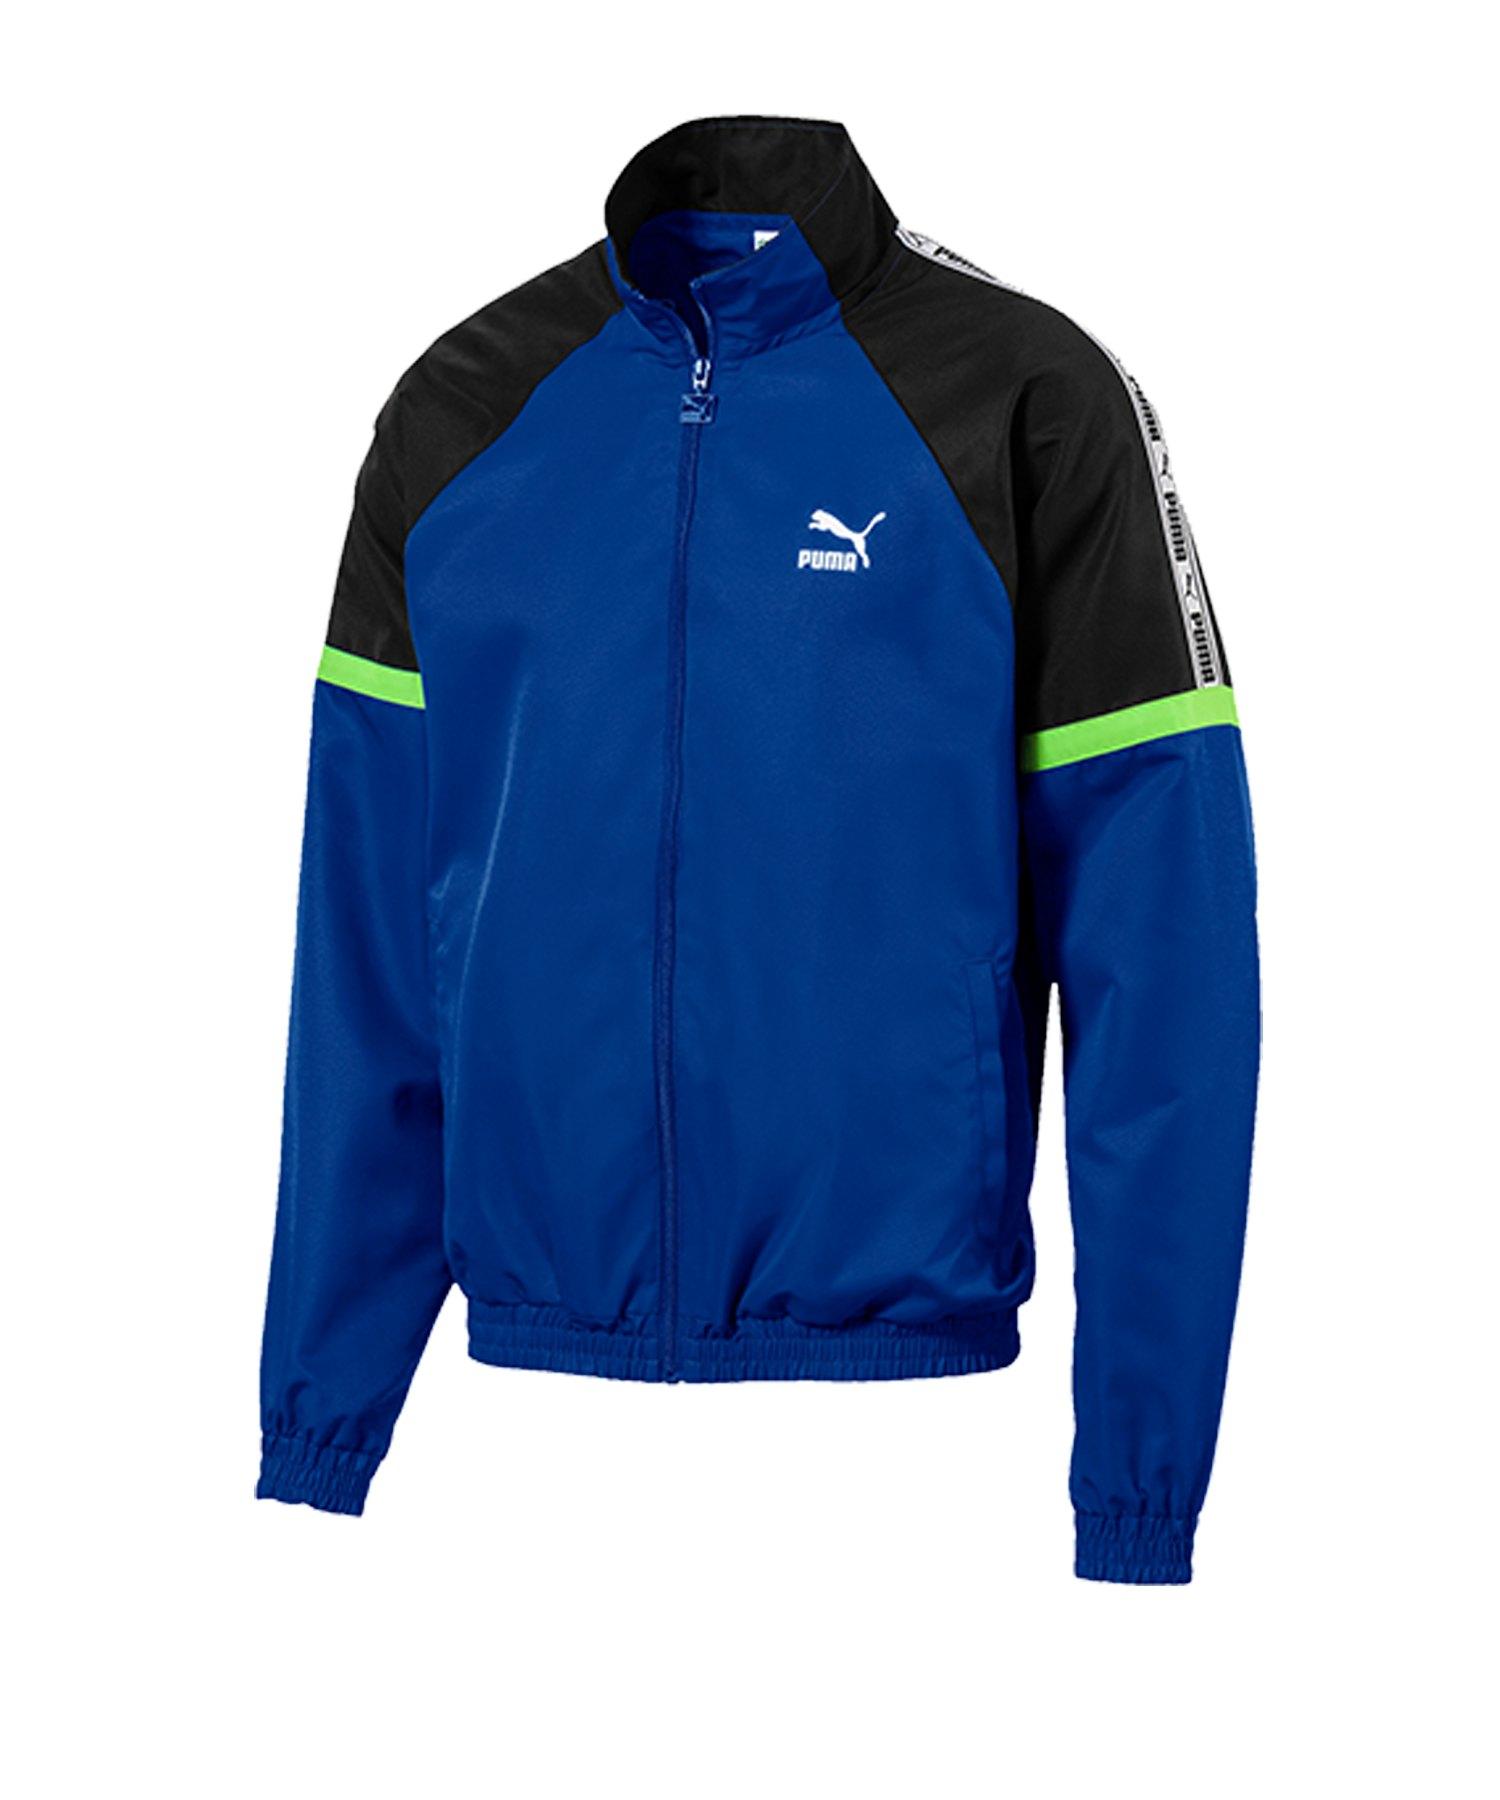 PUMA XTG Woven Jacket Jacke F97 - blau